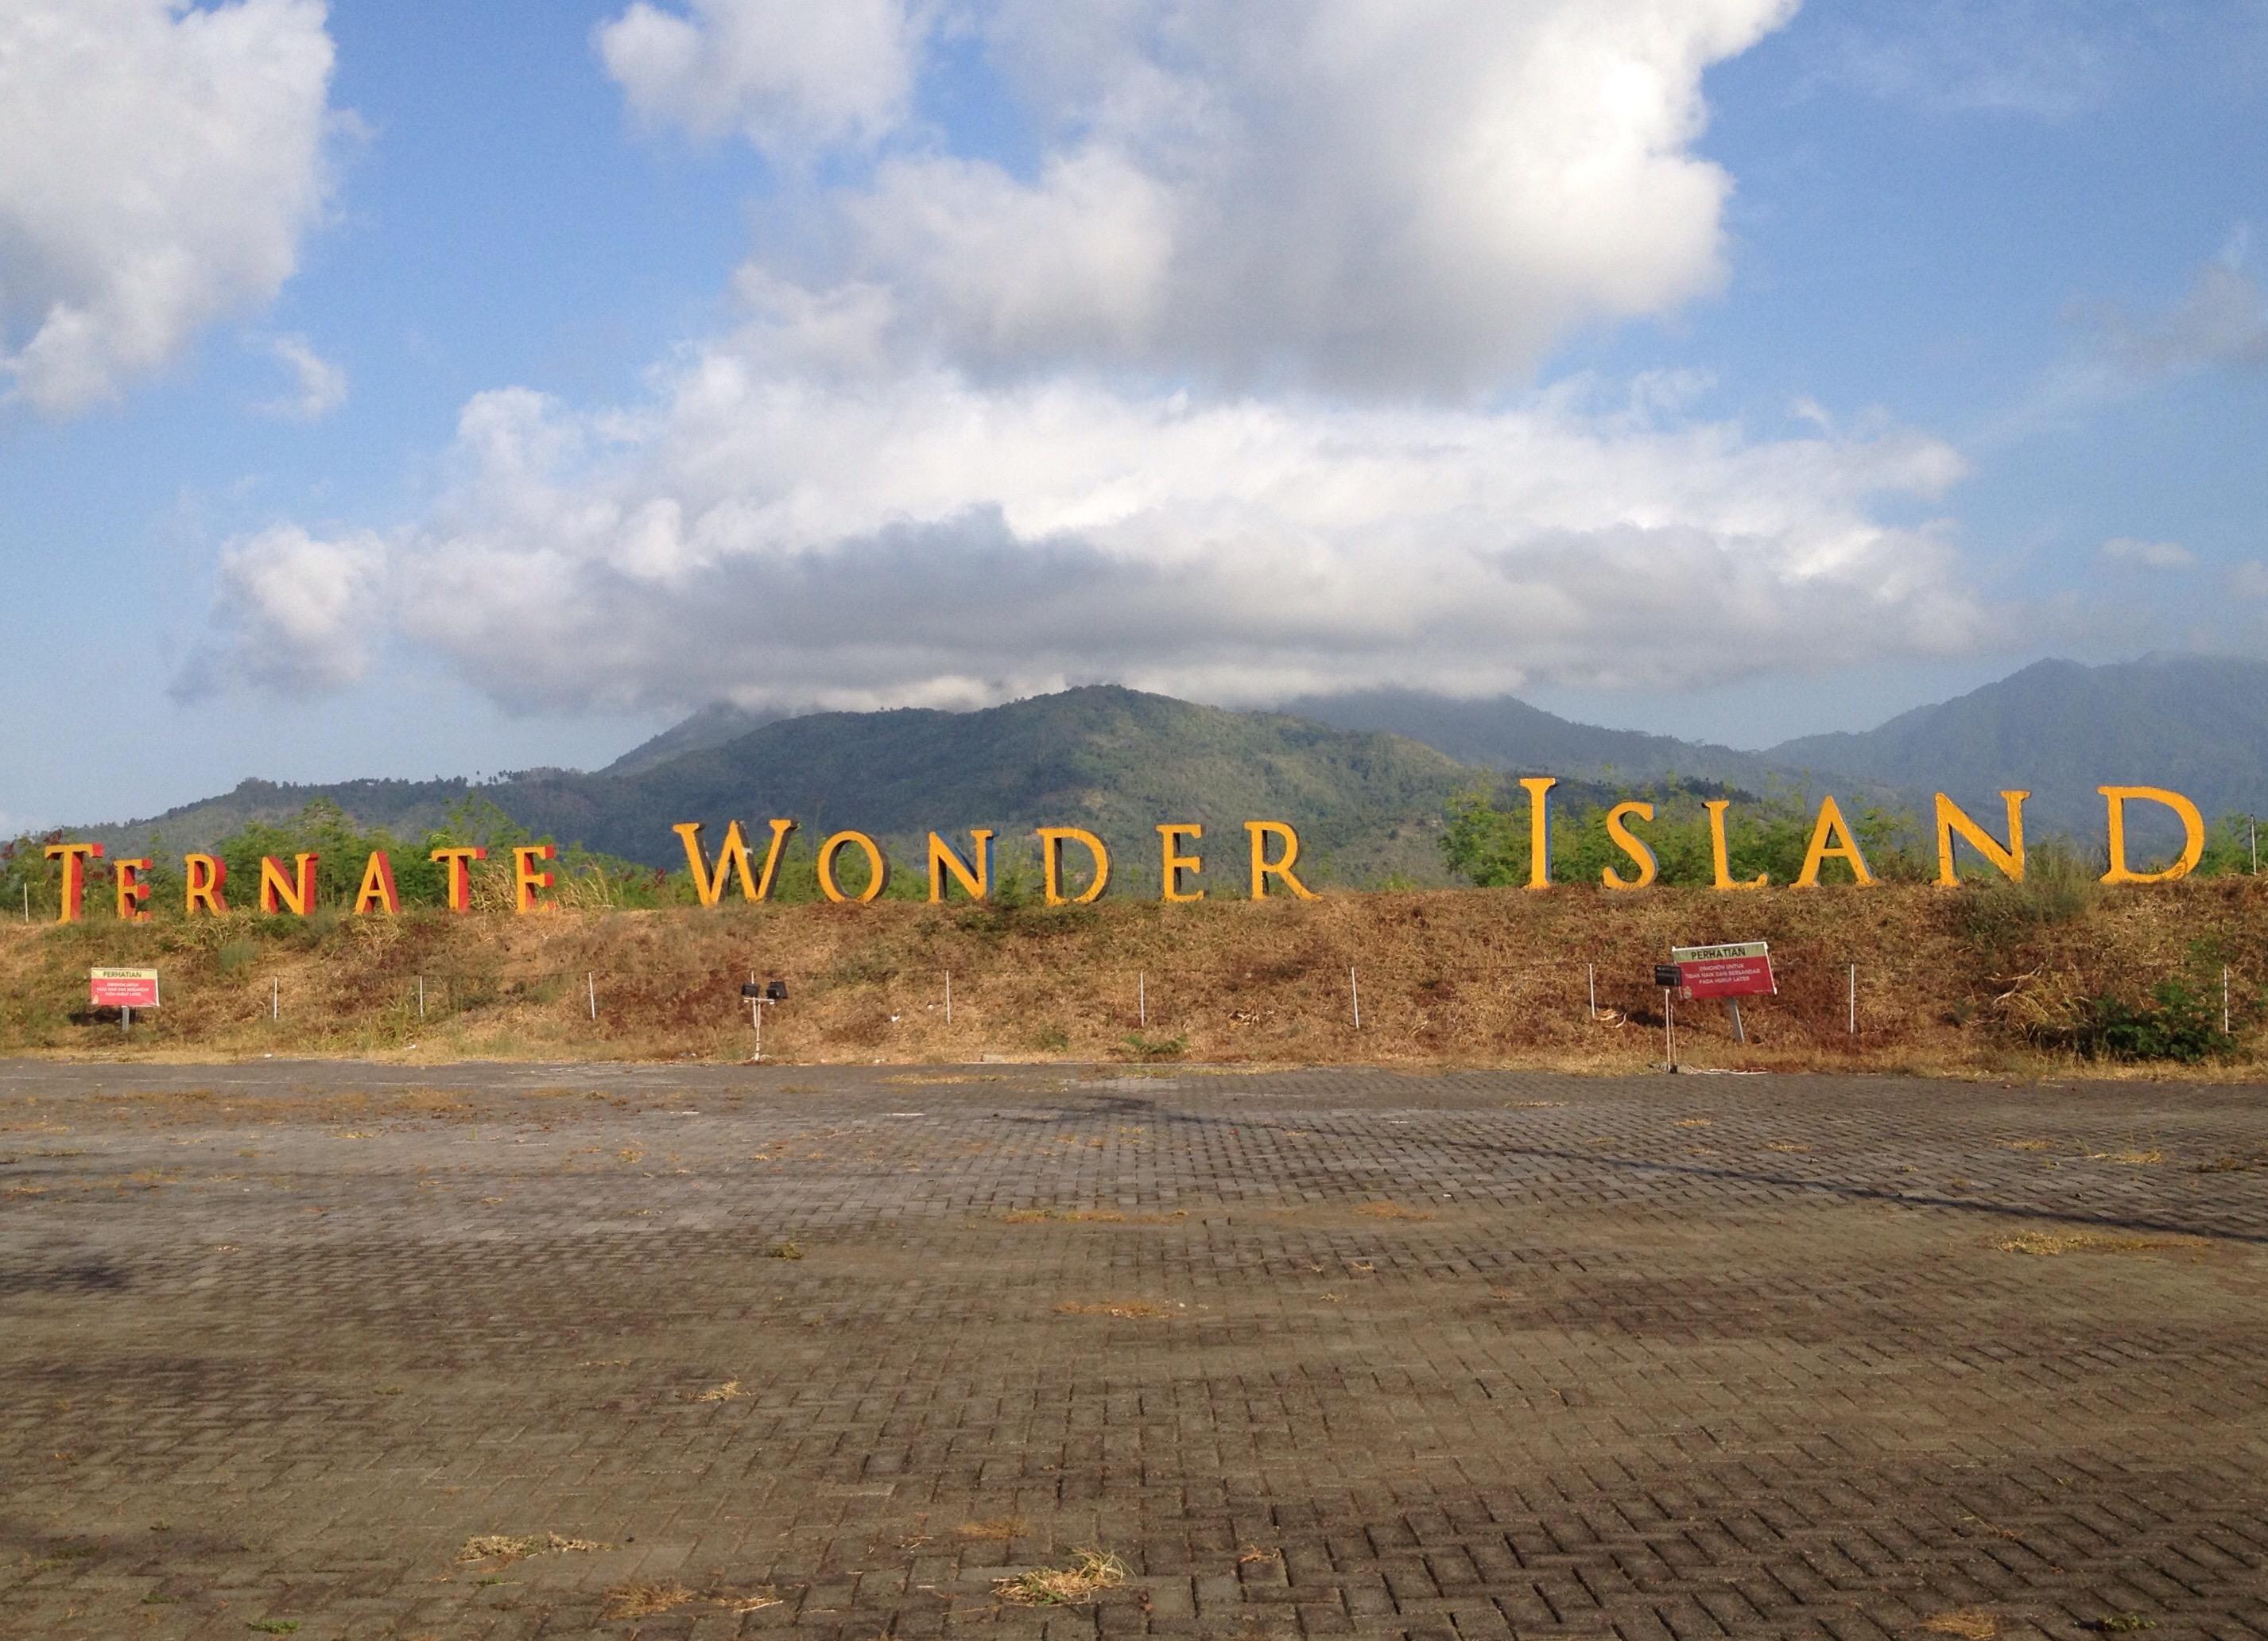 Cerita Ternate Day 1 Menjelajahi Benteng Peninggalan Sebelah Kalamata Disebutkan